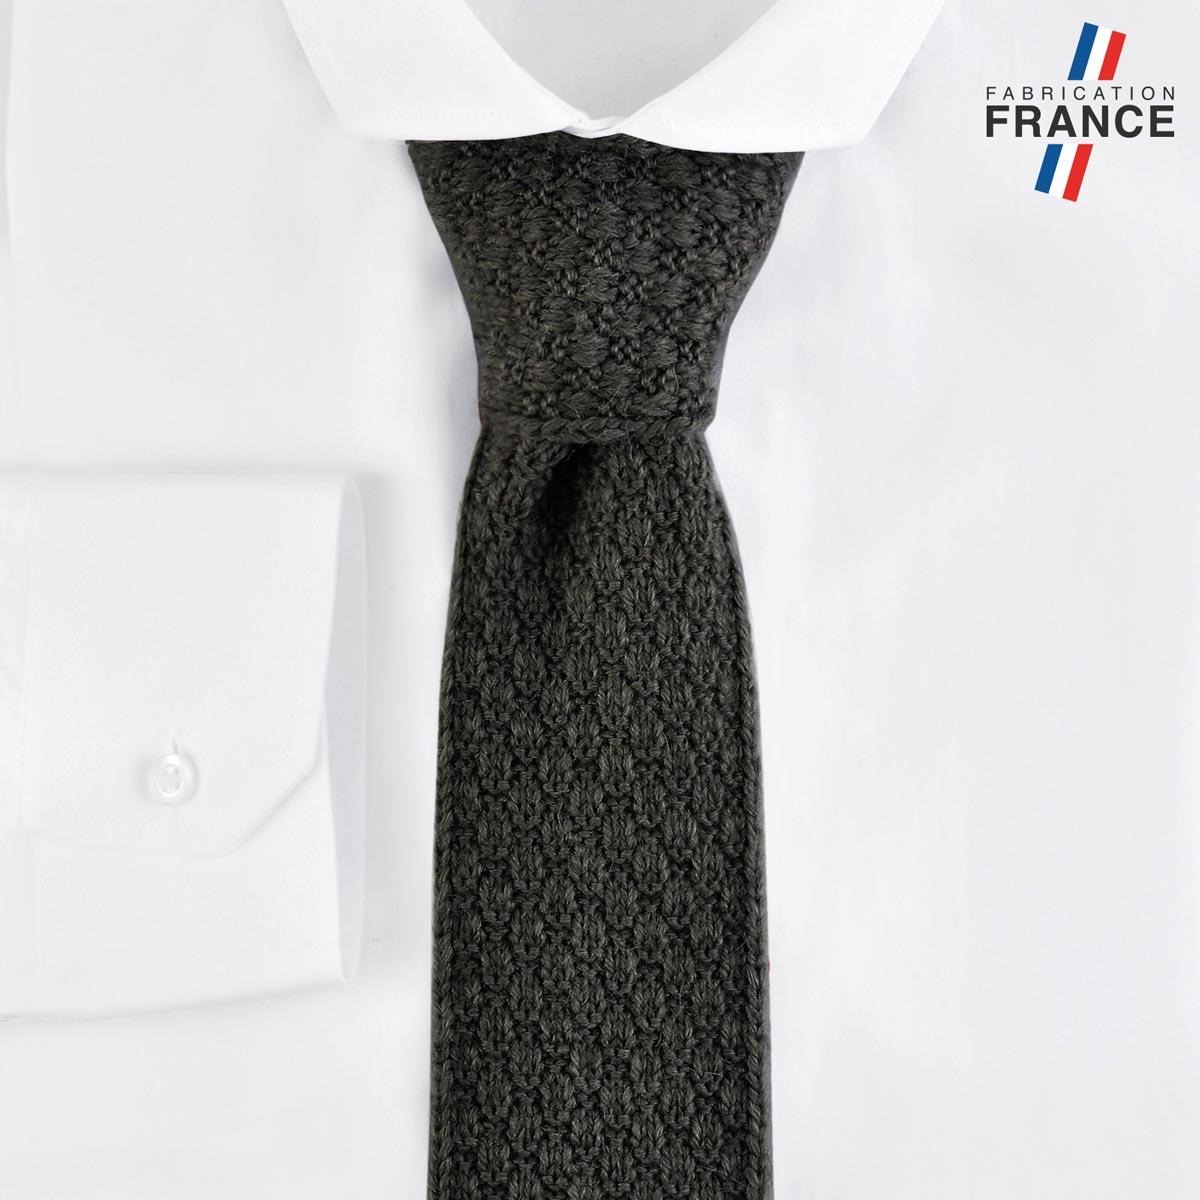 CV-00460_F12-2FR_Cravate-tricot-anthracite-fabrication-francaise